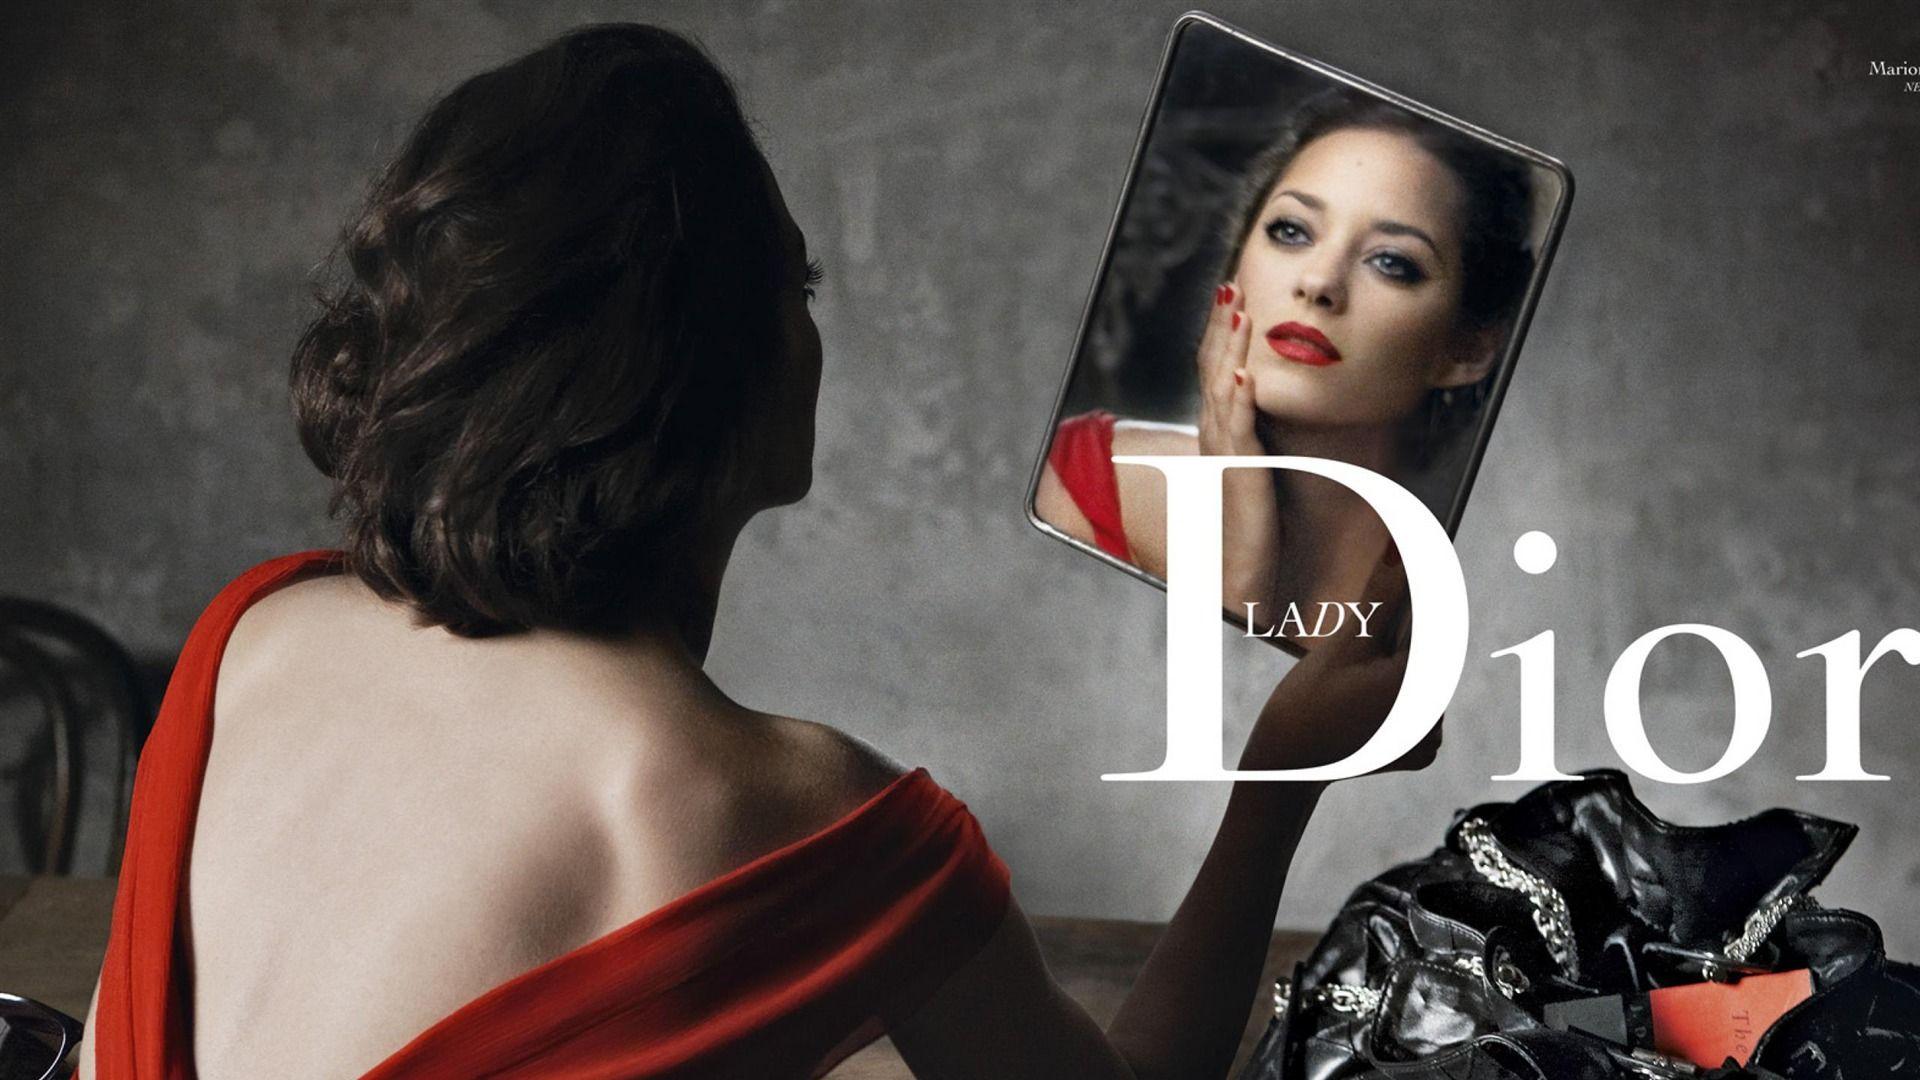 Dior Wallpaper Image